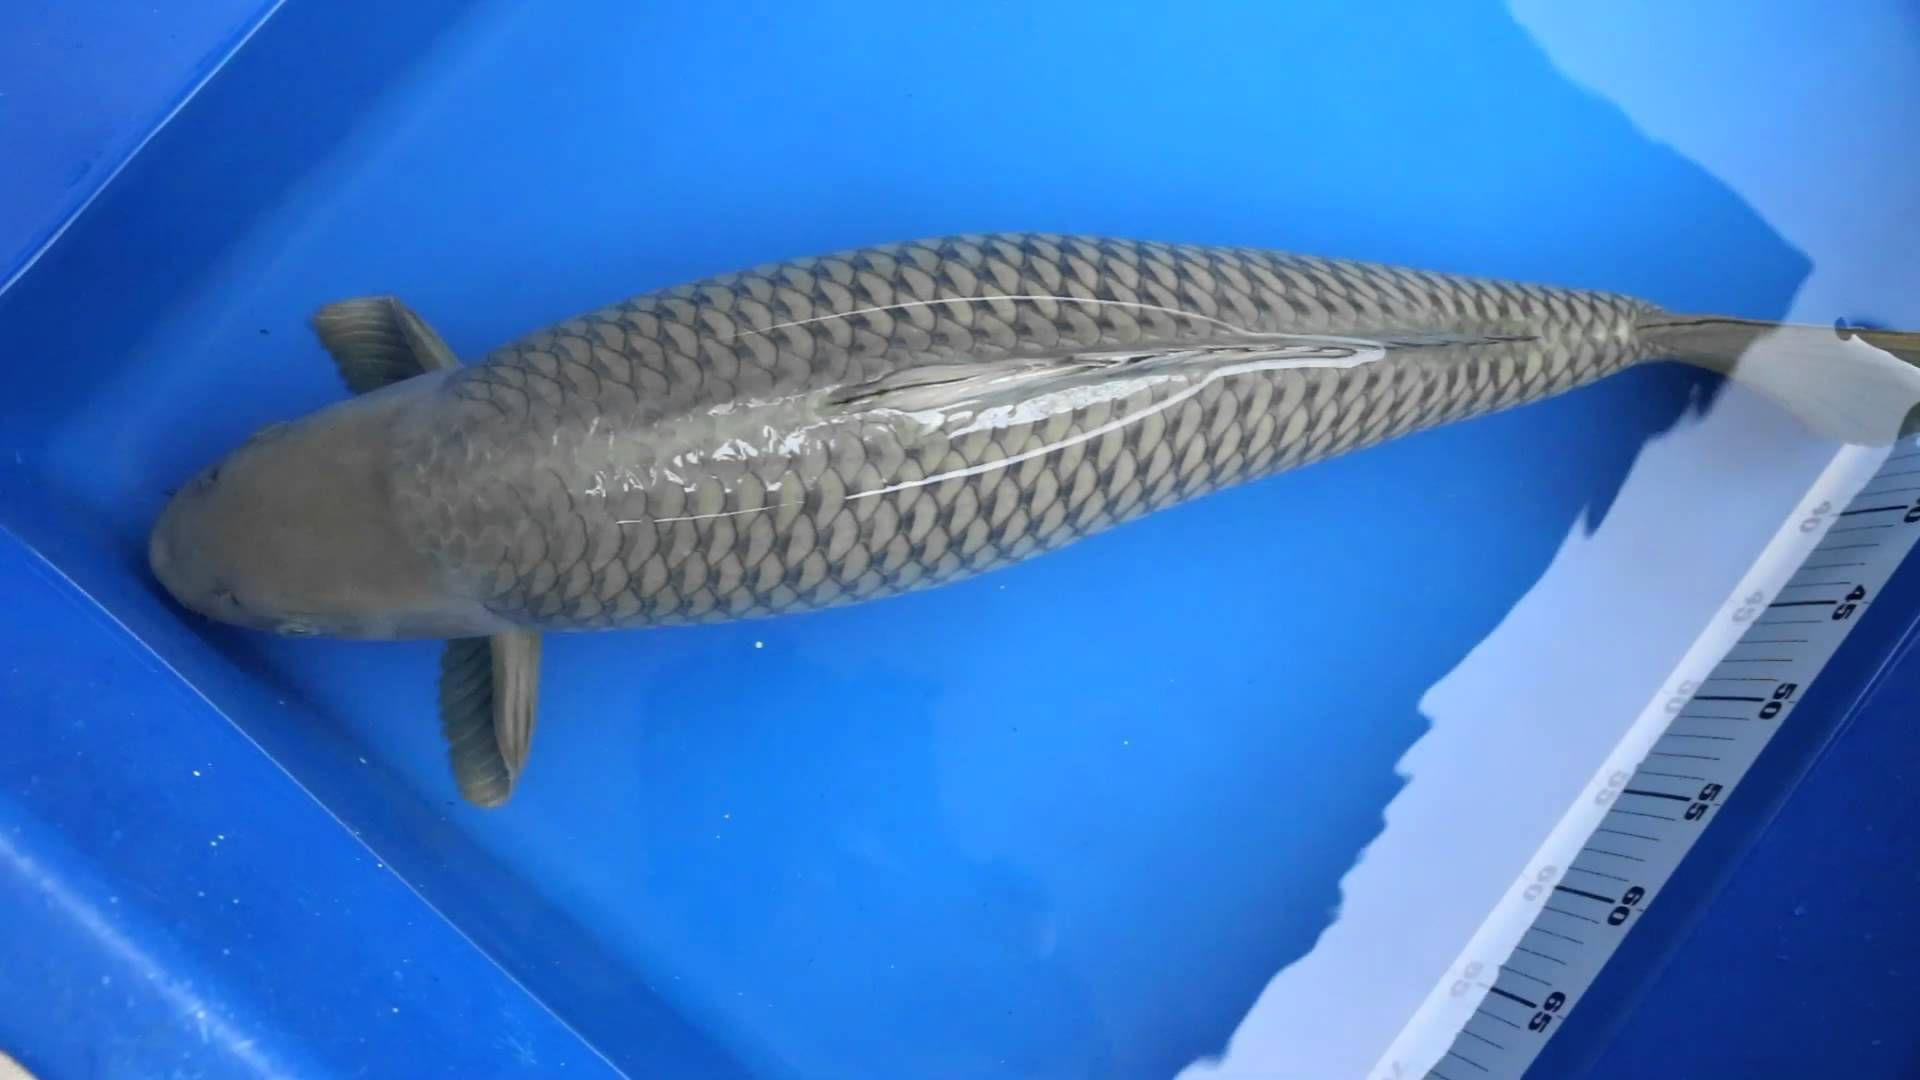 Marusei Chagoi Koi Fish Pond Koi Koi Fish